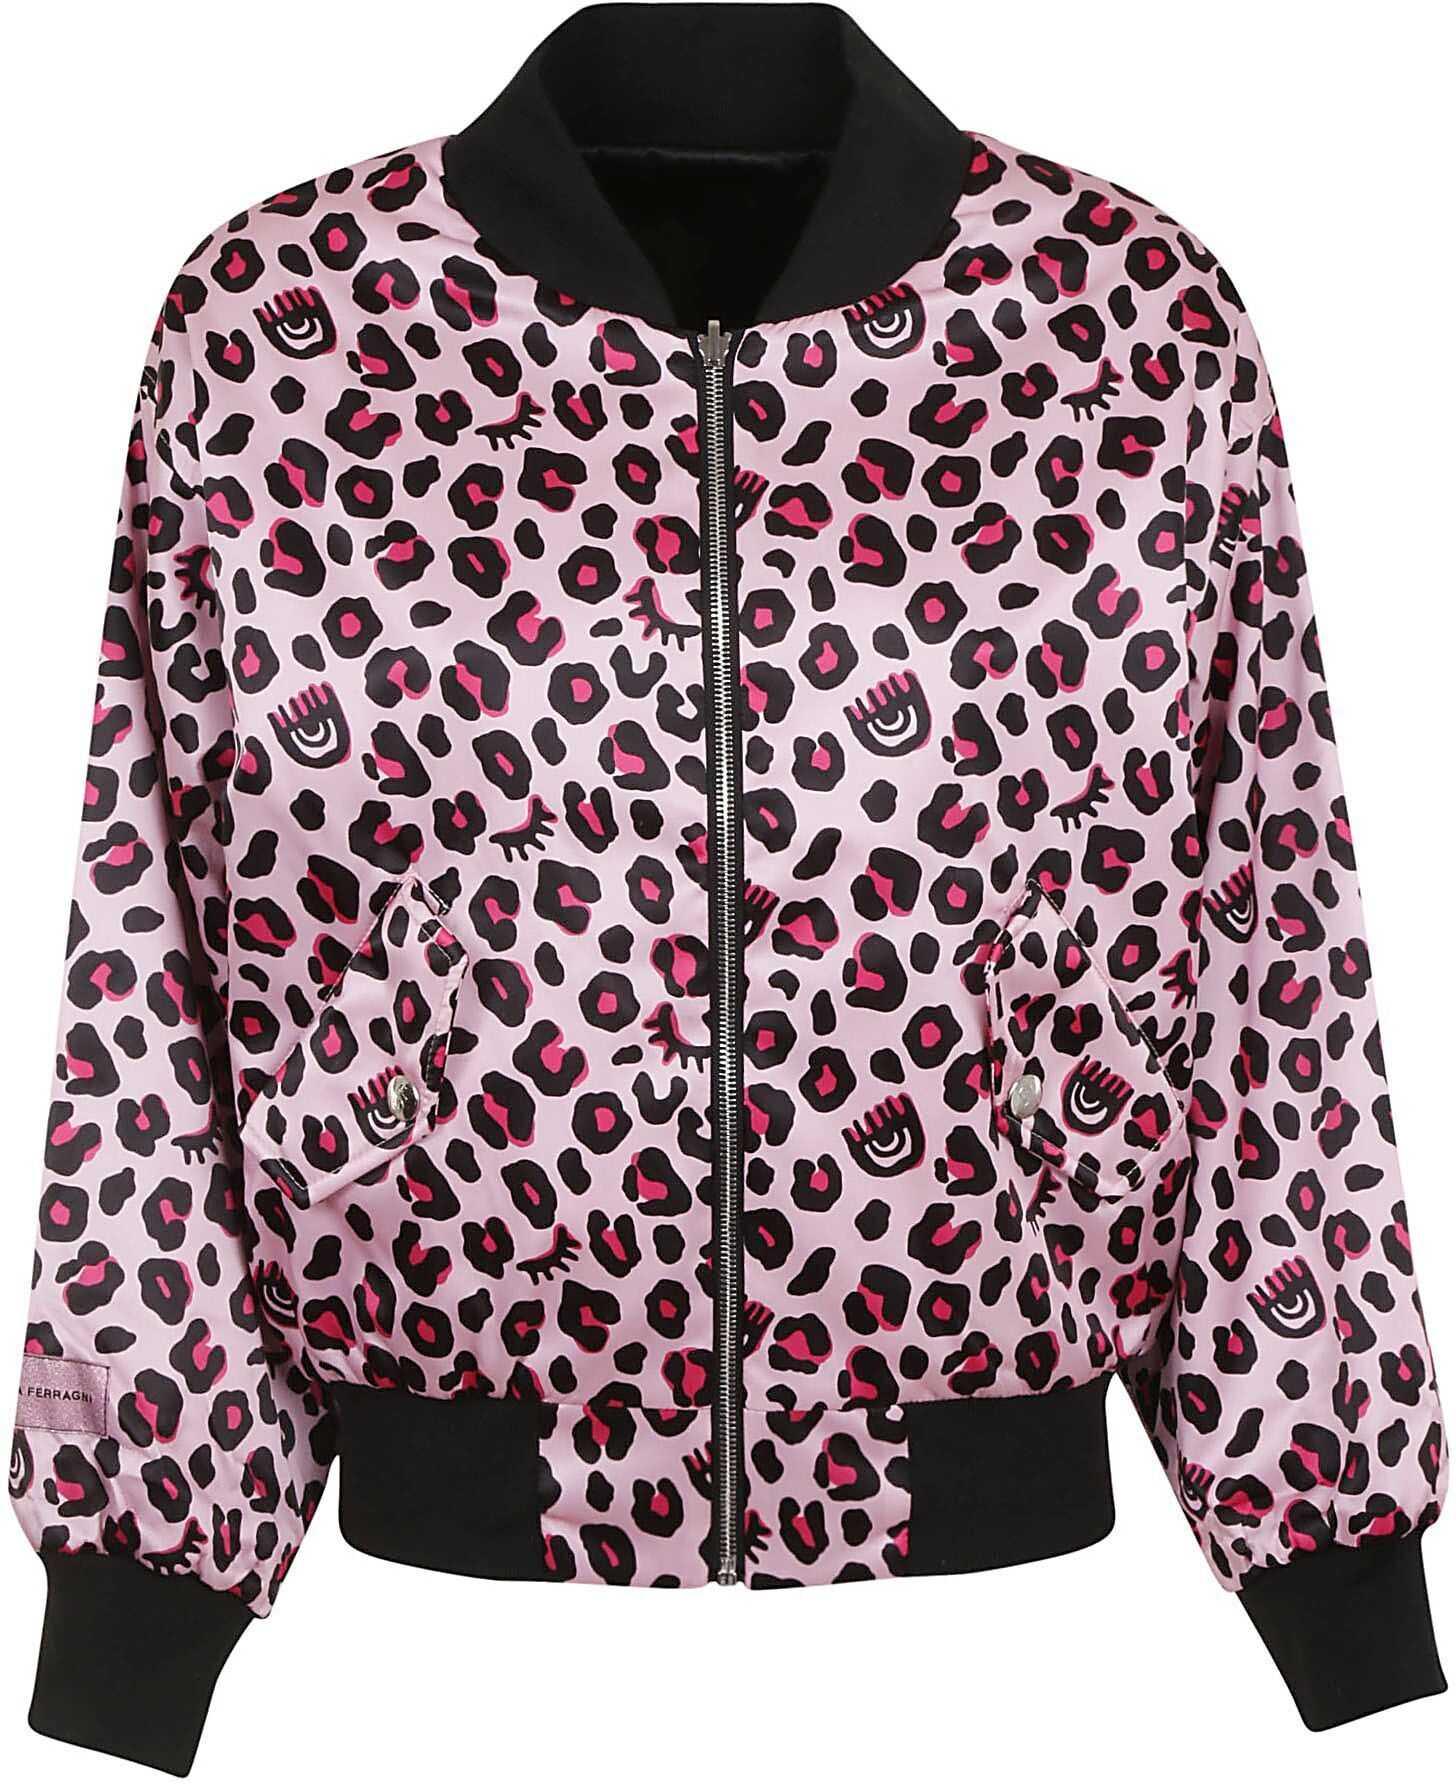 Chiara Ferragni Polyester Outerwear Jacket PINK